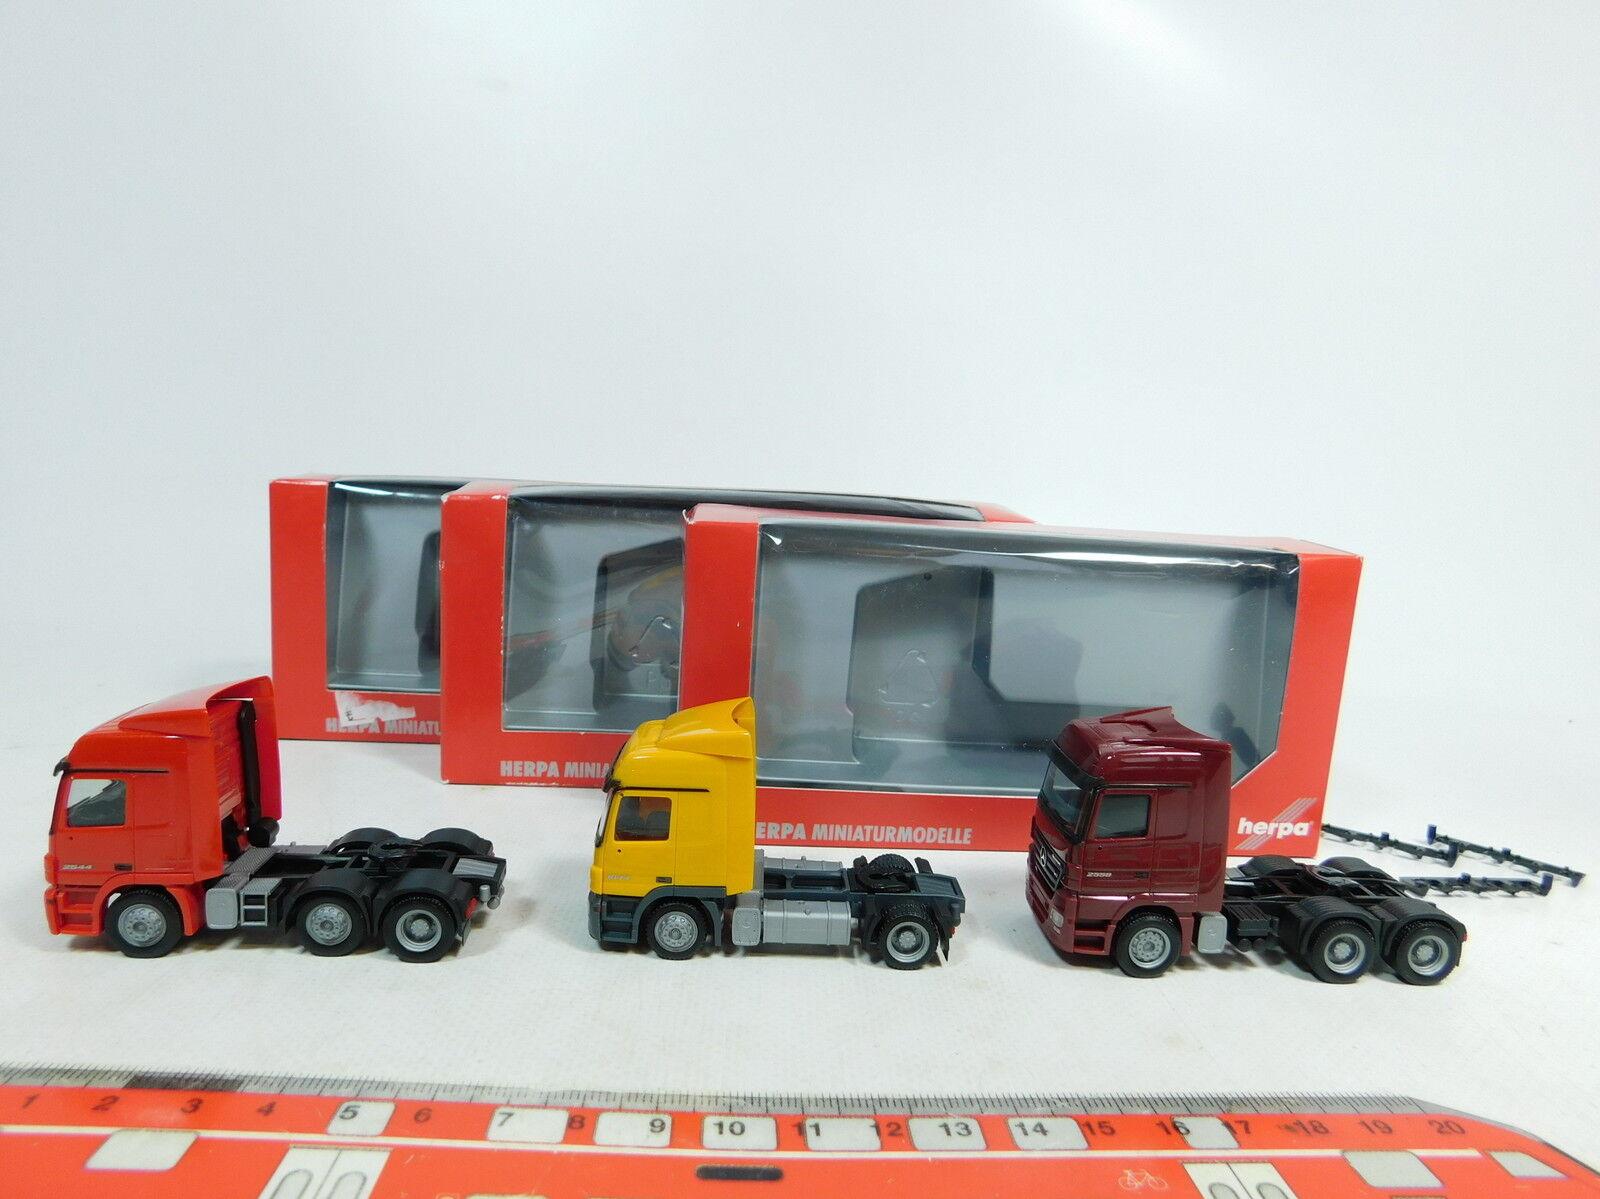 Ax690-0, 5  3x HERPA h0 (1 87) tracteur MB  153874+150460+151399, Neuw + OVP